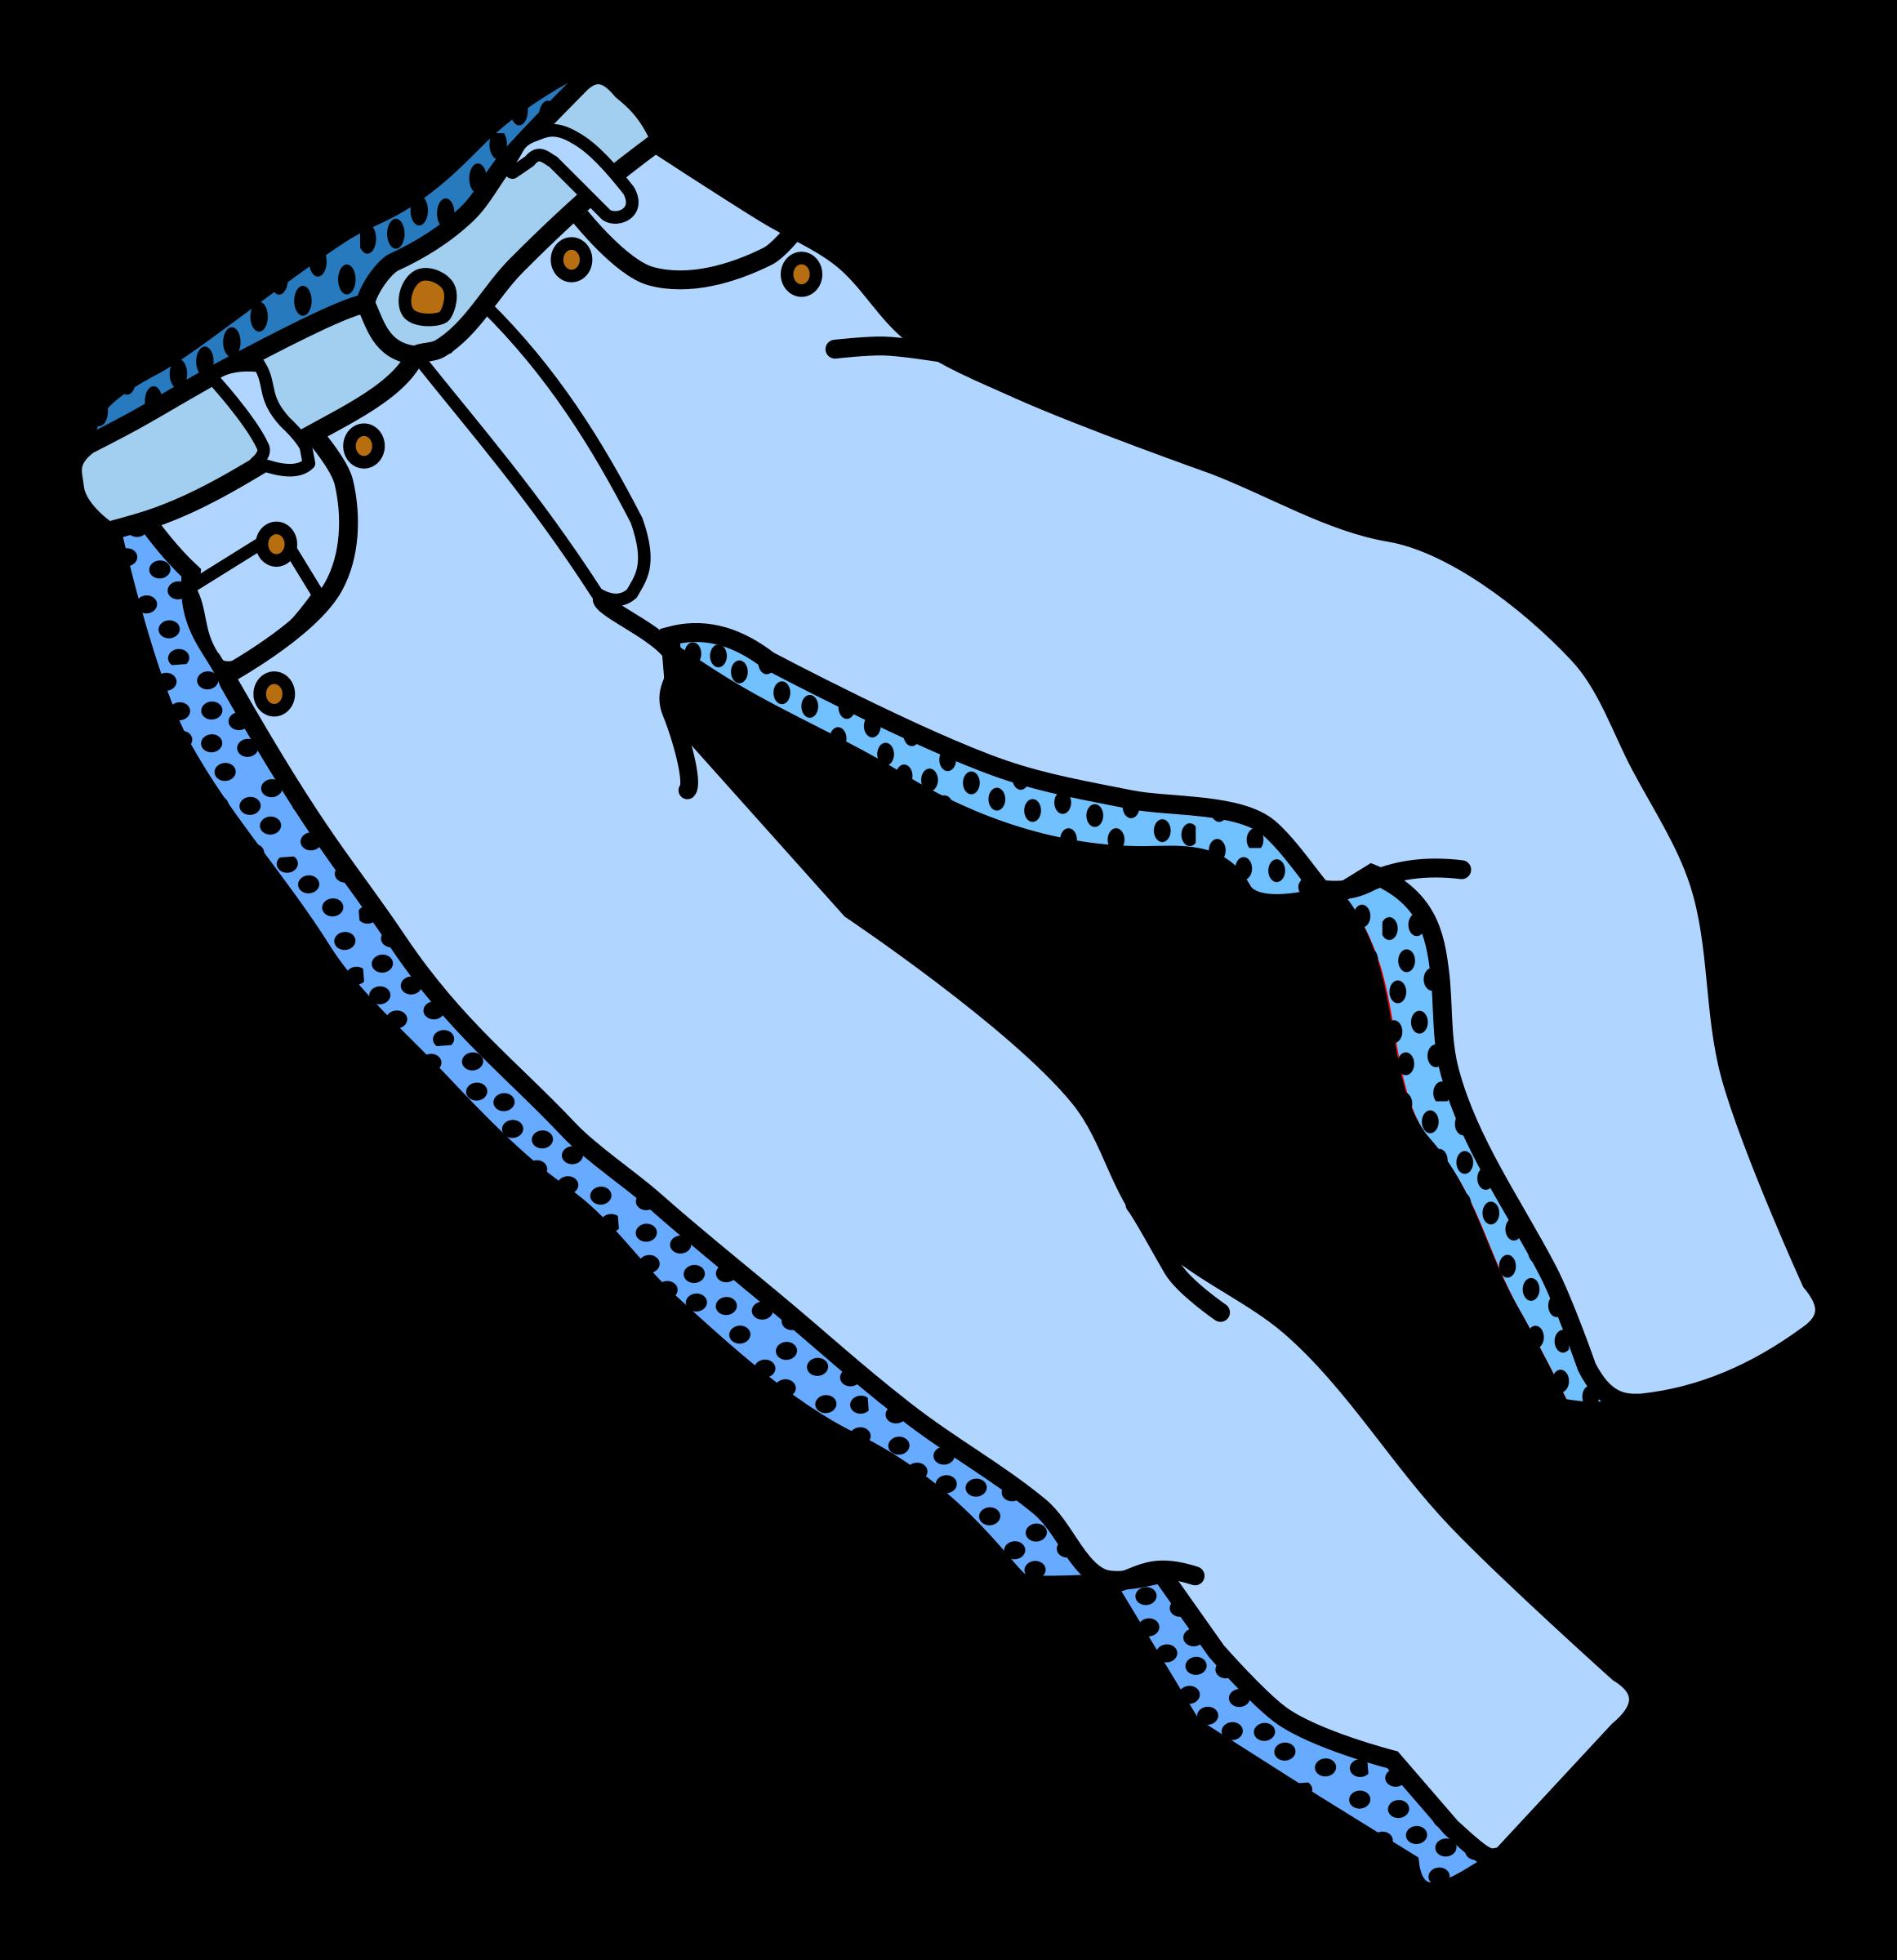 jeans trousers clipart 3464 transparentpng rh transparentpng com clip art plants and animals clip art panther images